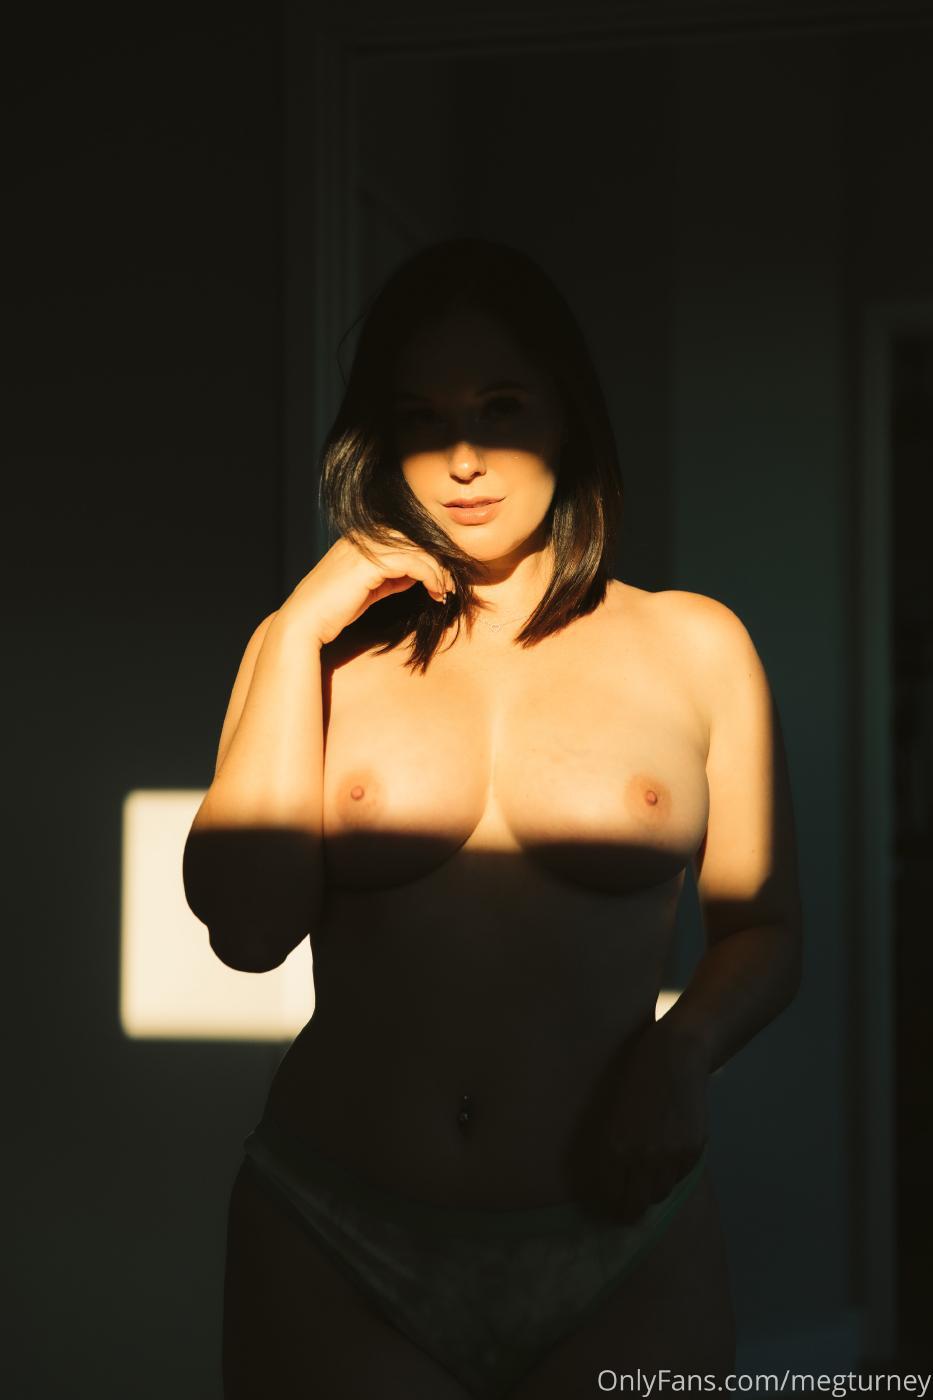 Meg Turney Nude Sunset Onlyfans Set Leaked Rdfxhh